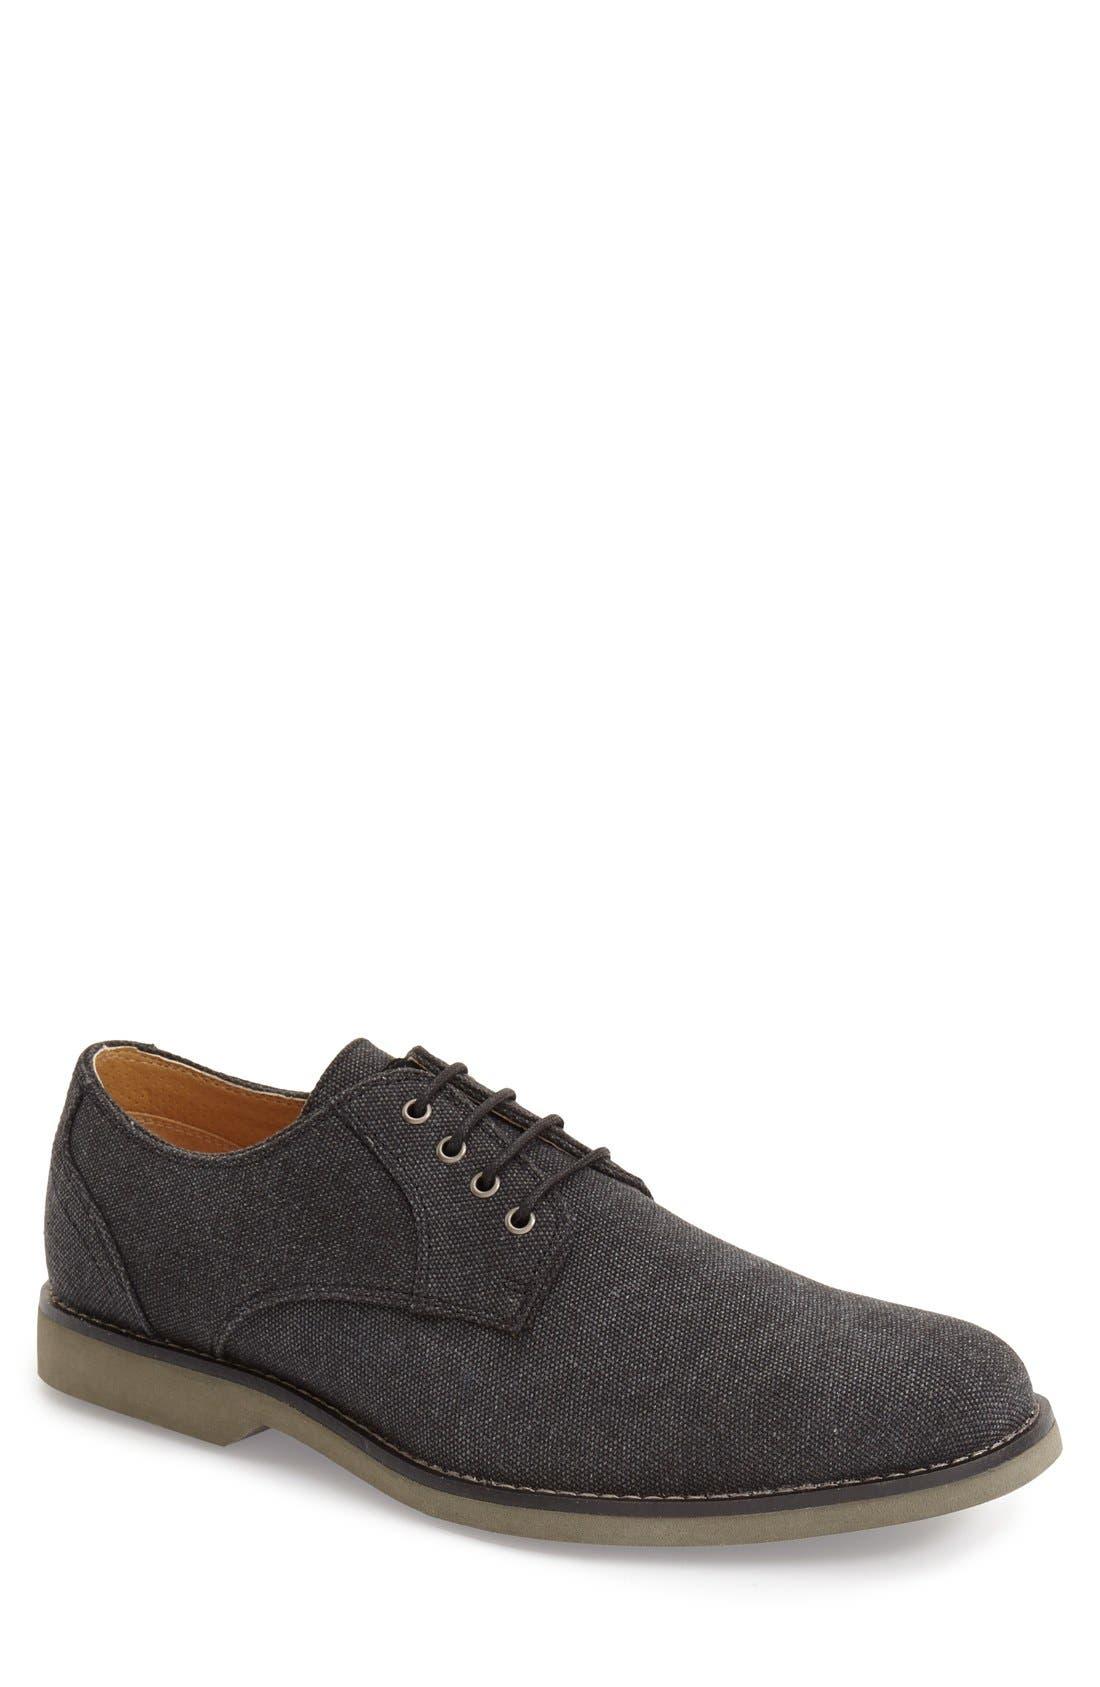 'Proctor' Buck Shoe, Main, color, 001